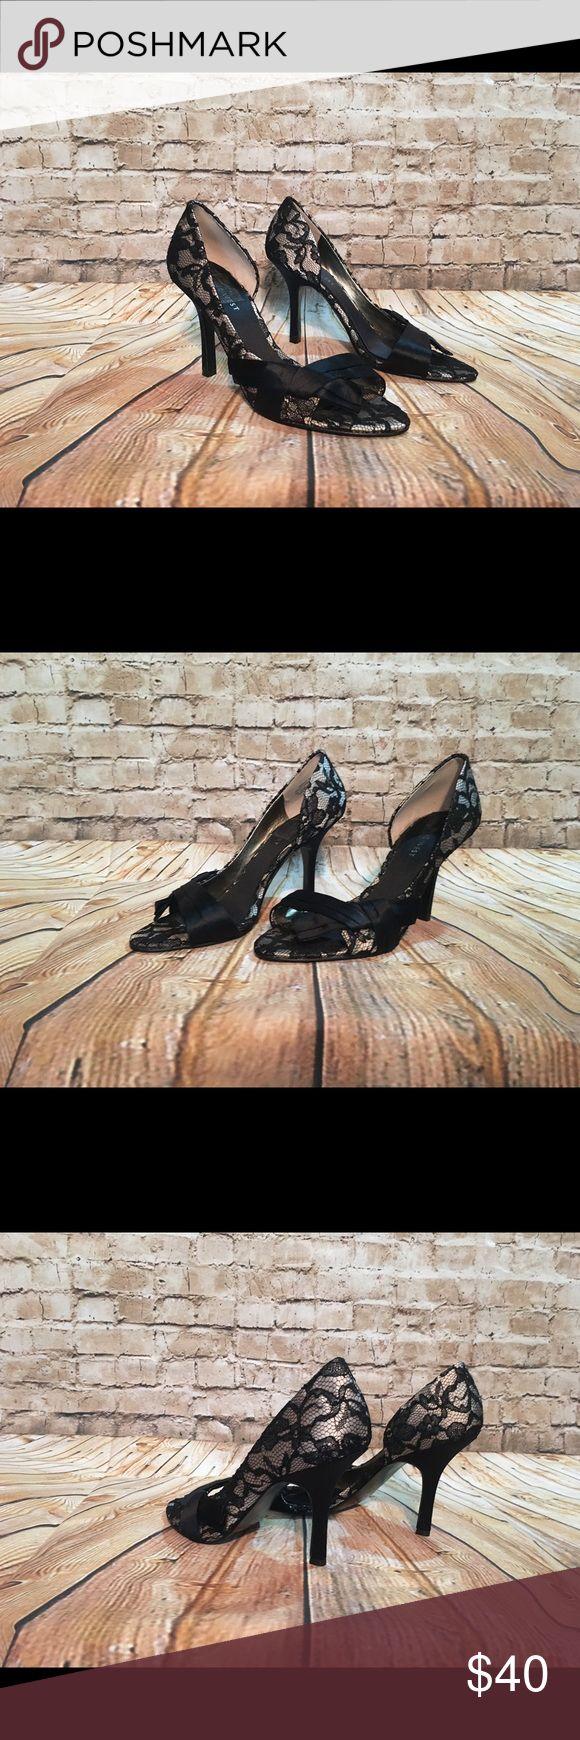 WOMEN'S NINE WEST HEELS SIZE 7.5M Lacy Stylish Heel. Nine West Size 7.5M Nine West Shoes Heels